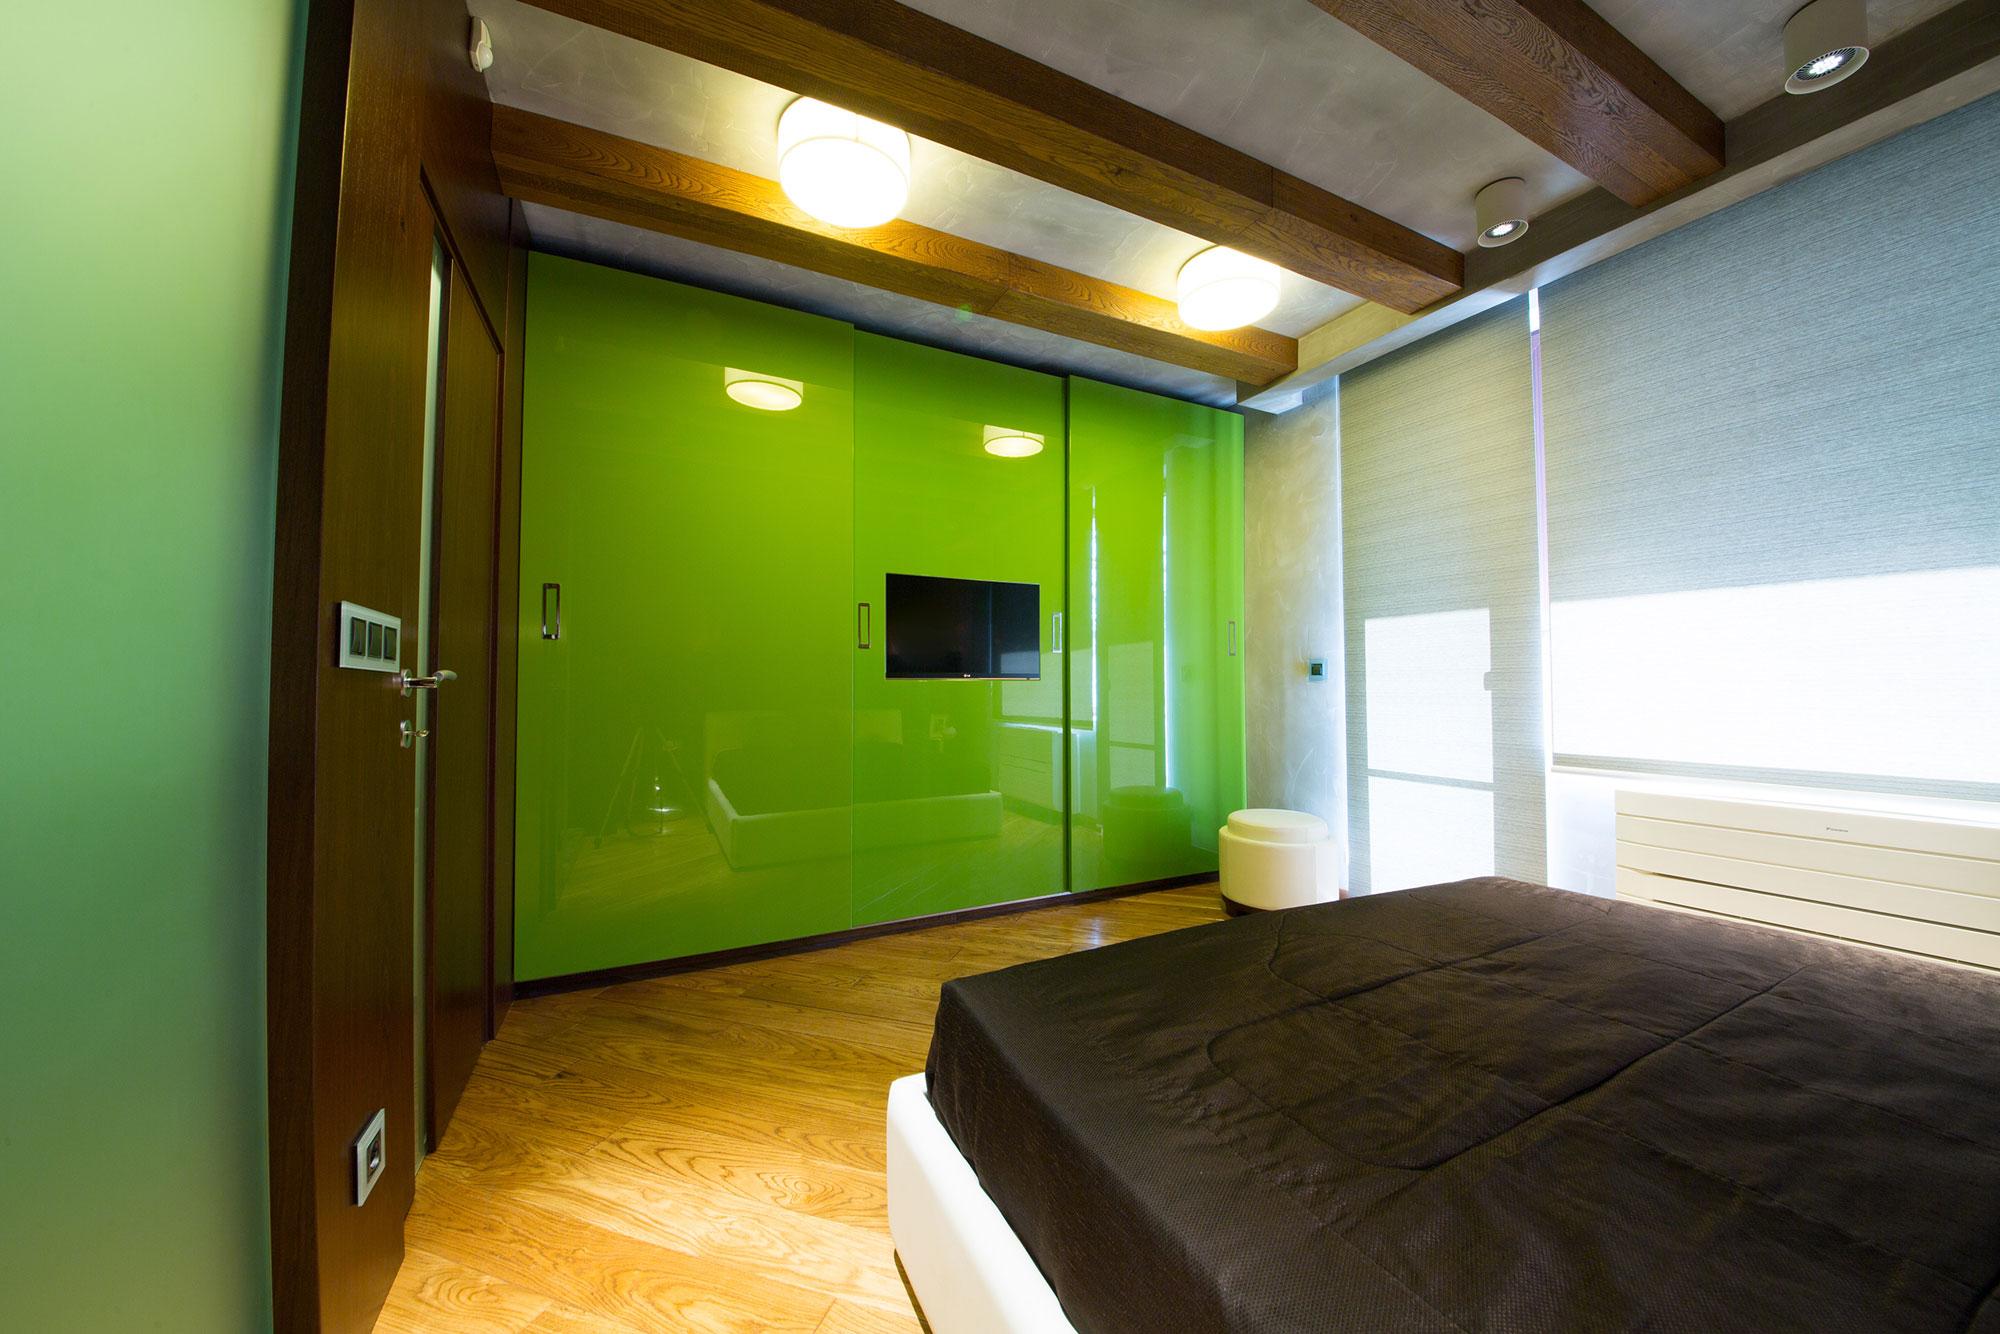 apartment 120 sq meters by m2 design studio. Black Bedroom Furniture Sets. Home Design Ideas